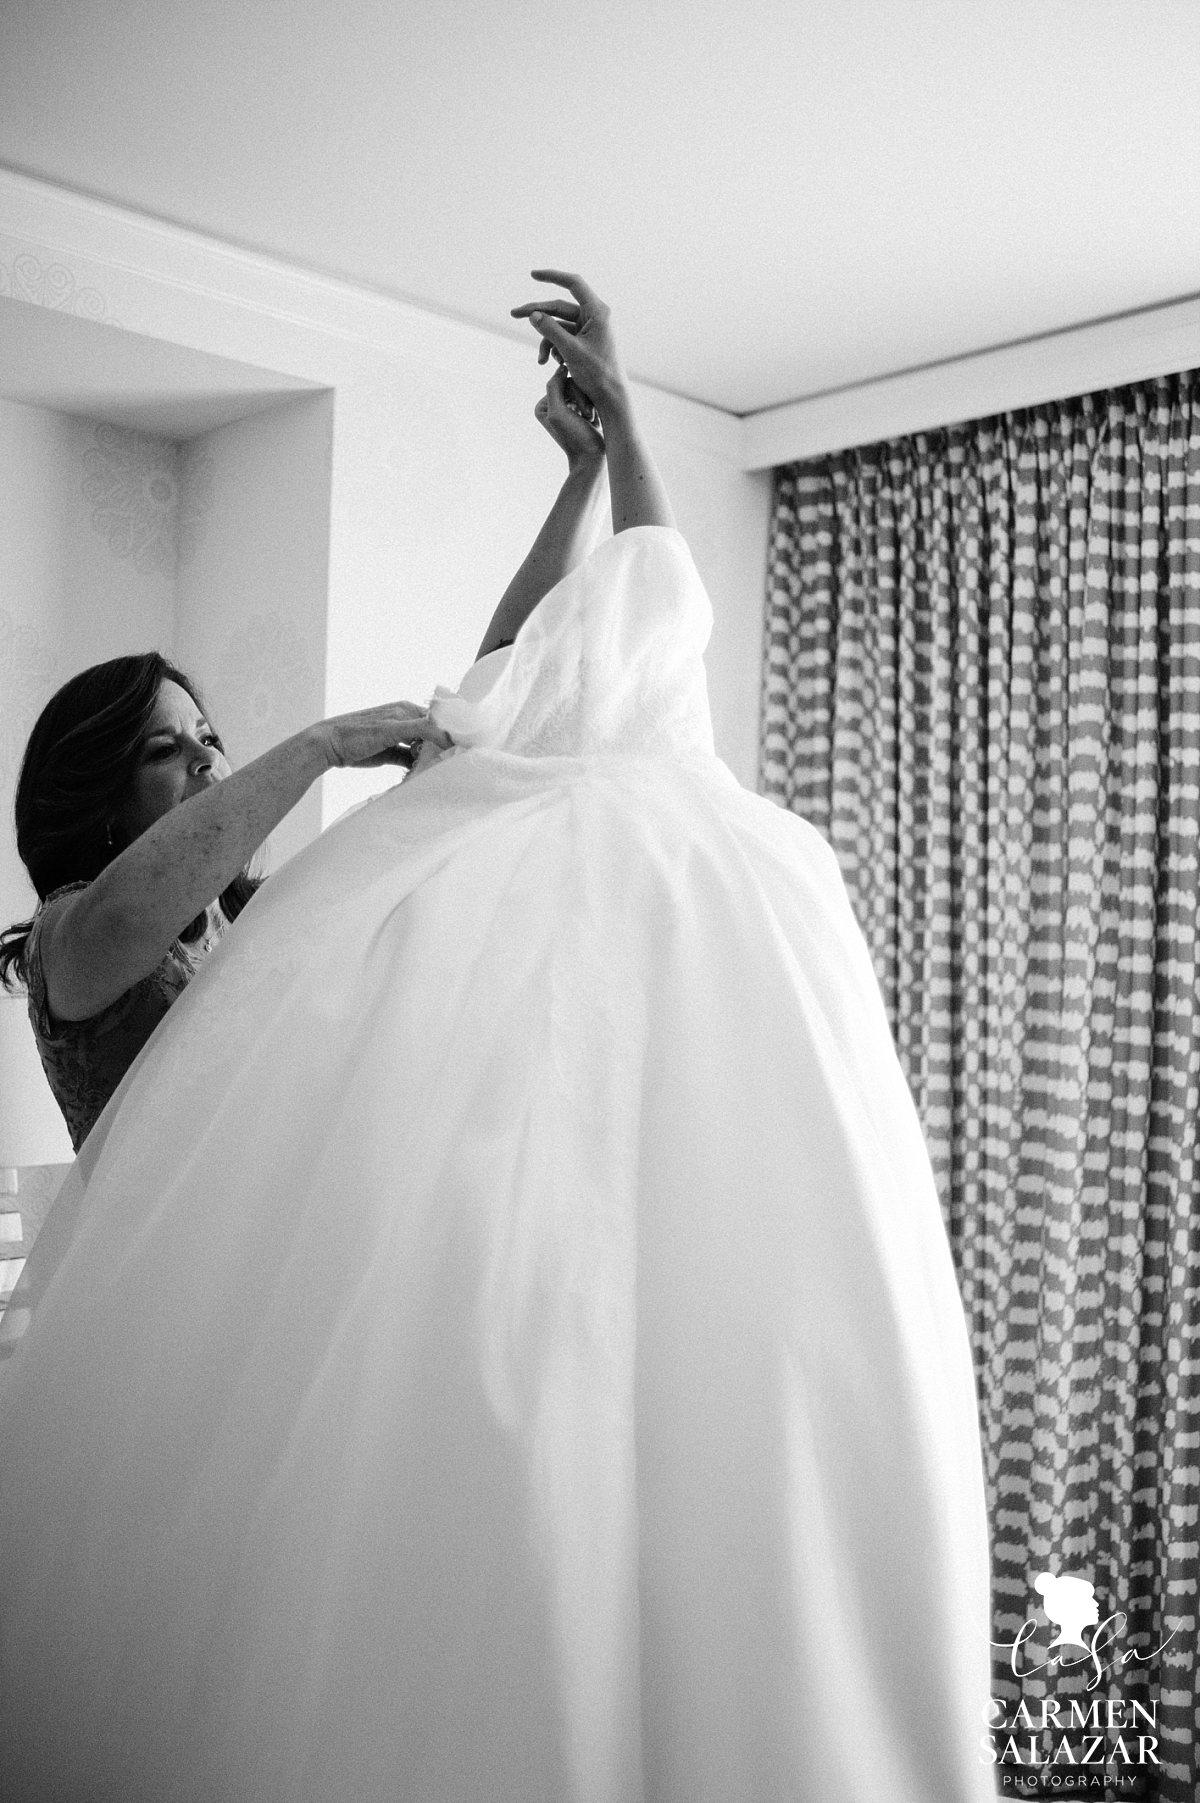 Bride getting dressed at Fairmont- Carmen Salazar